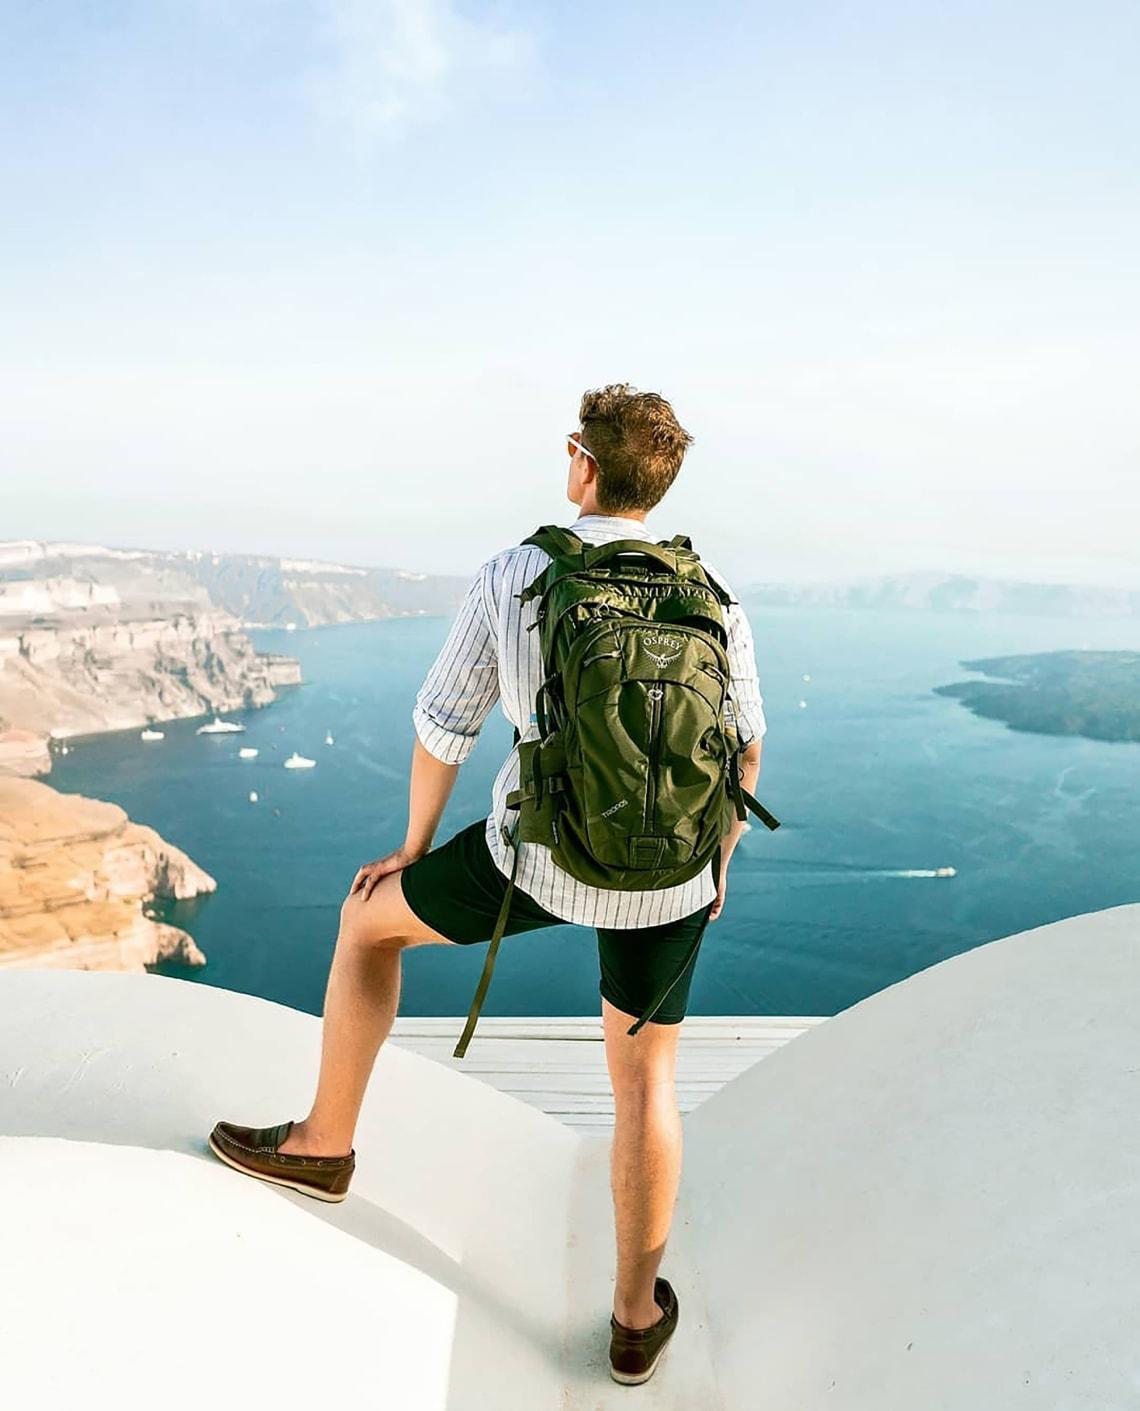 Traveler on sabbatical enjoying beautiful coastal views